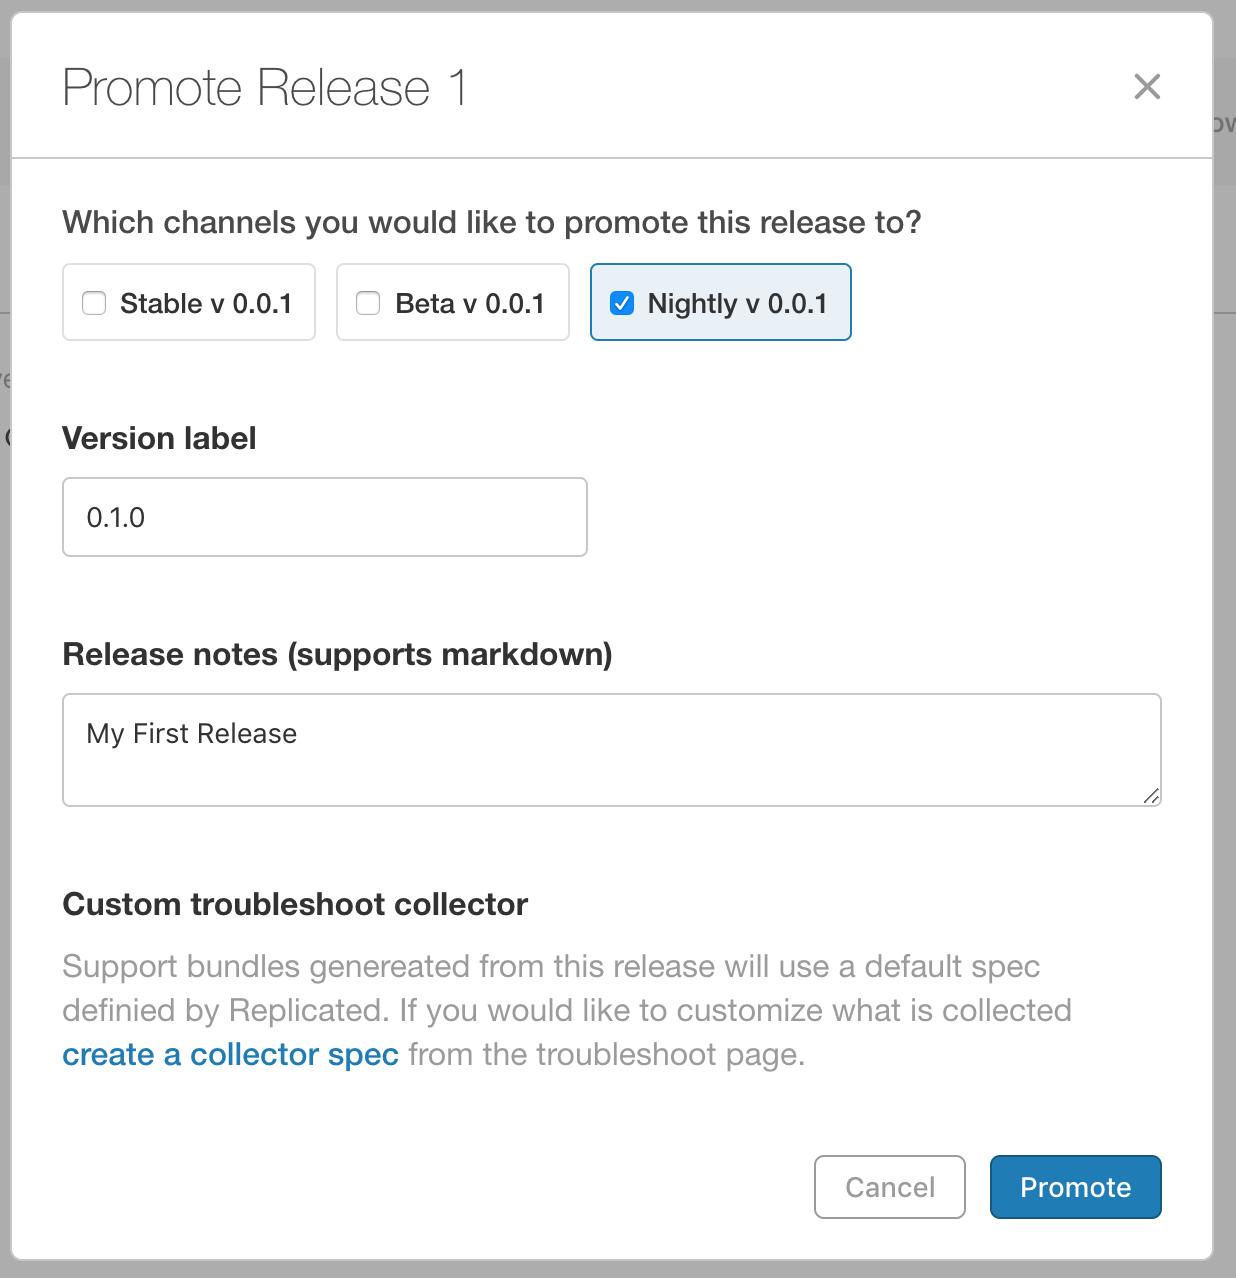 Promote Release